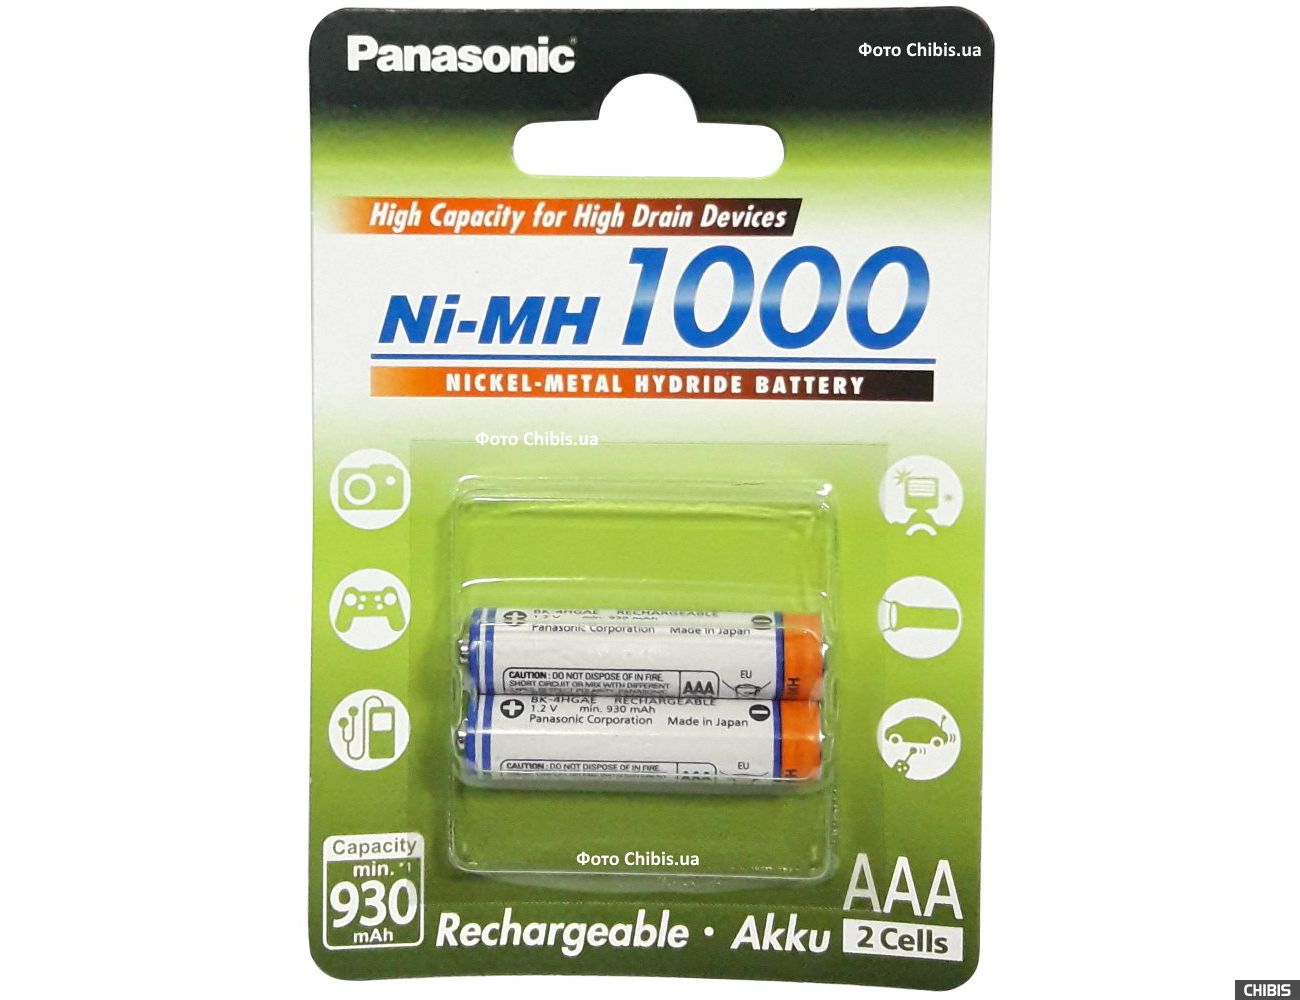 Аккумуляторы ААА Panasonic High Capacity 1000 mAh NI-MH 2/2 шт.